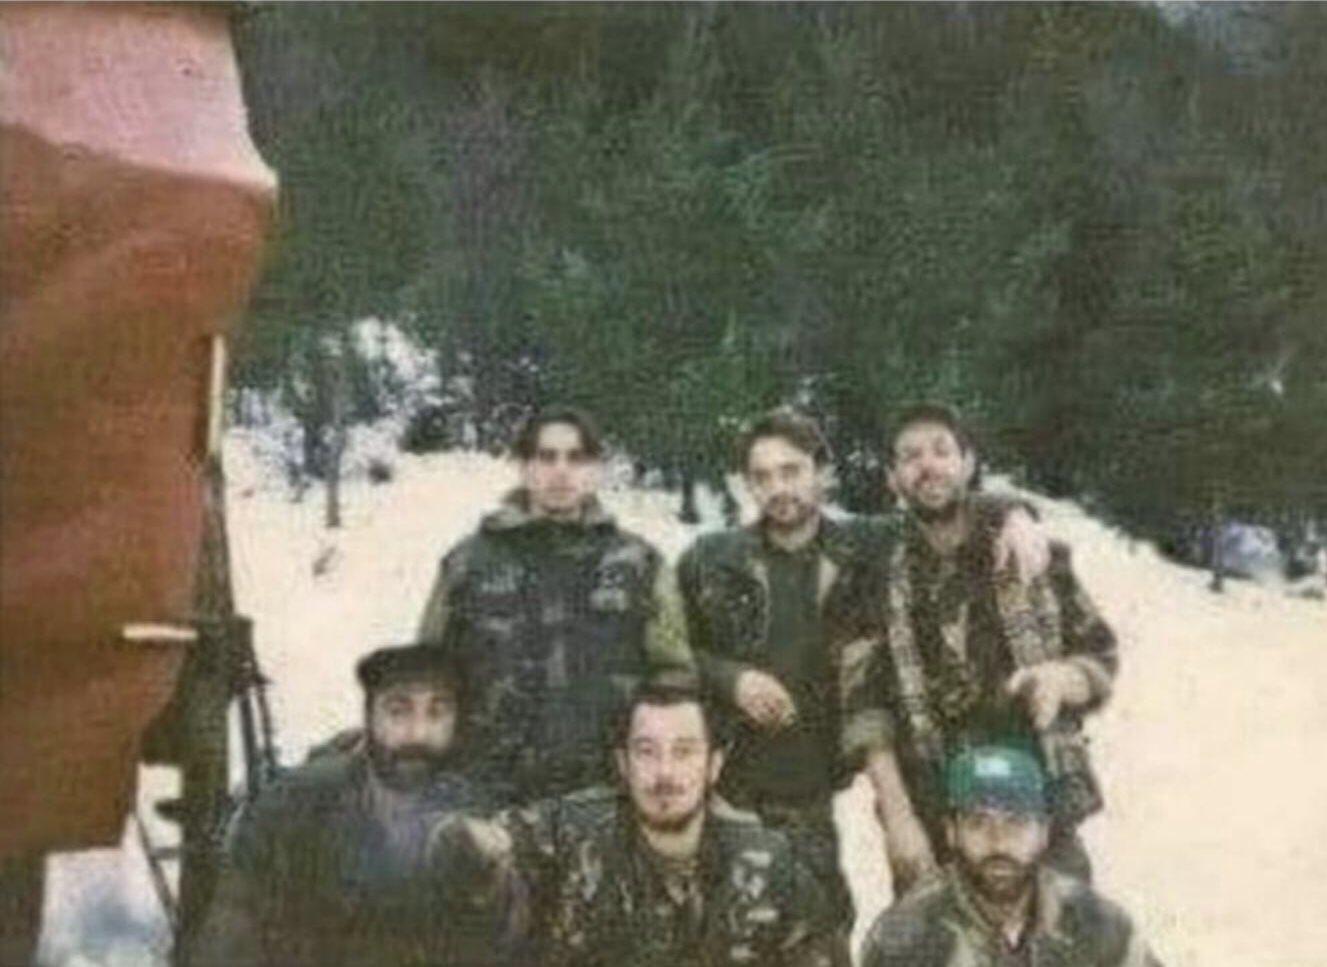 Fotografija iz 1993.: Komšić s Armijom BiH u napadu na hr Kreševo Komsic_armija